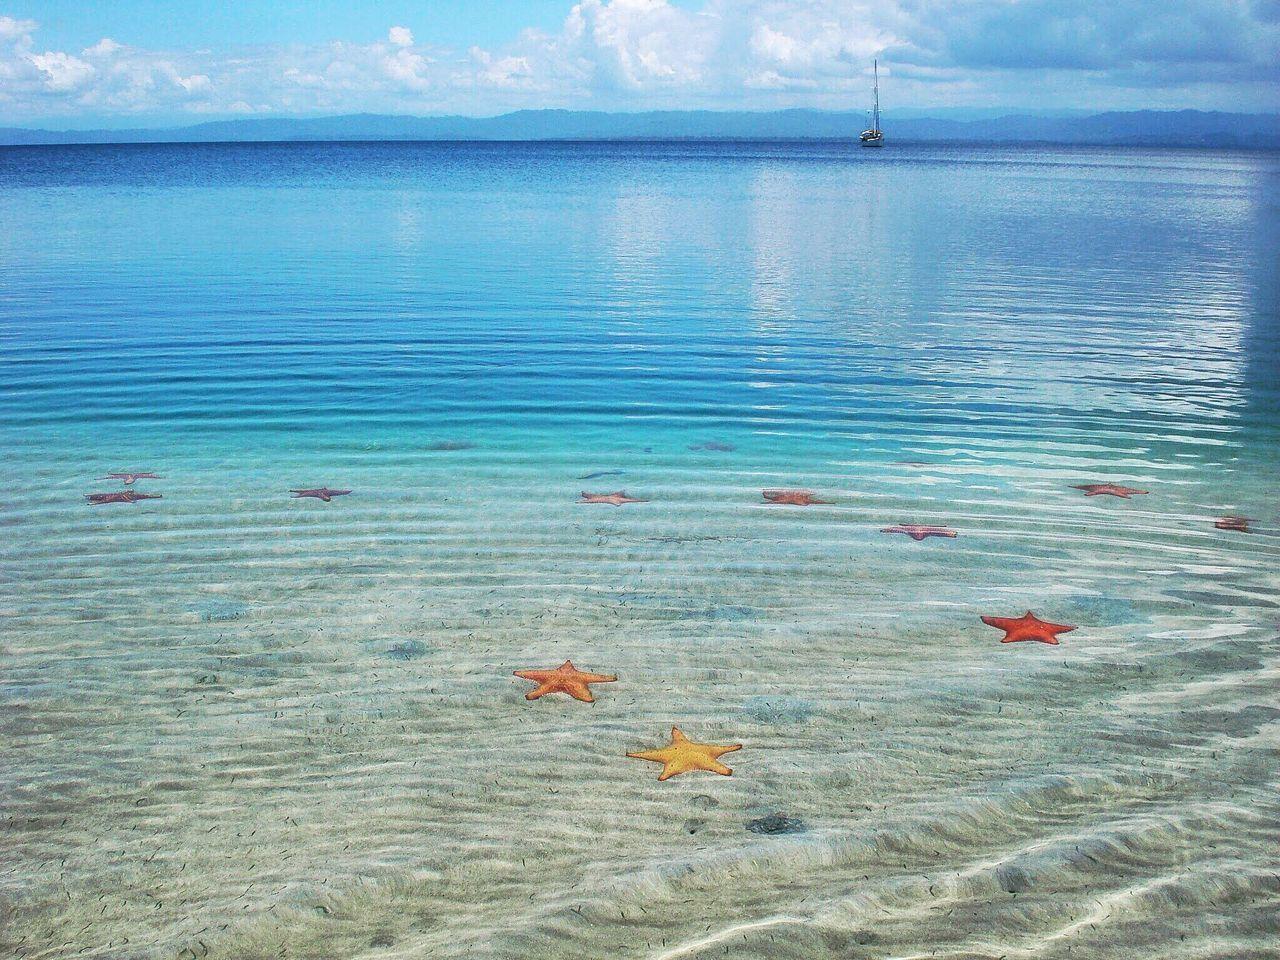 EyeEmNewHere Sea Caribbean Sea Stars Water Stars